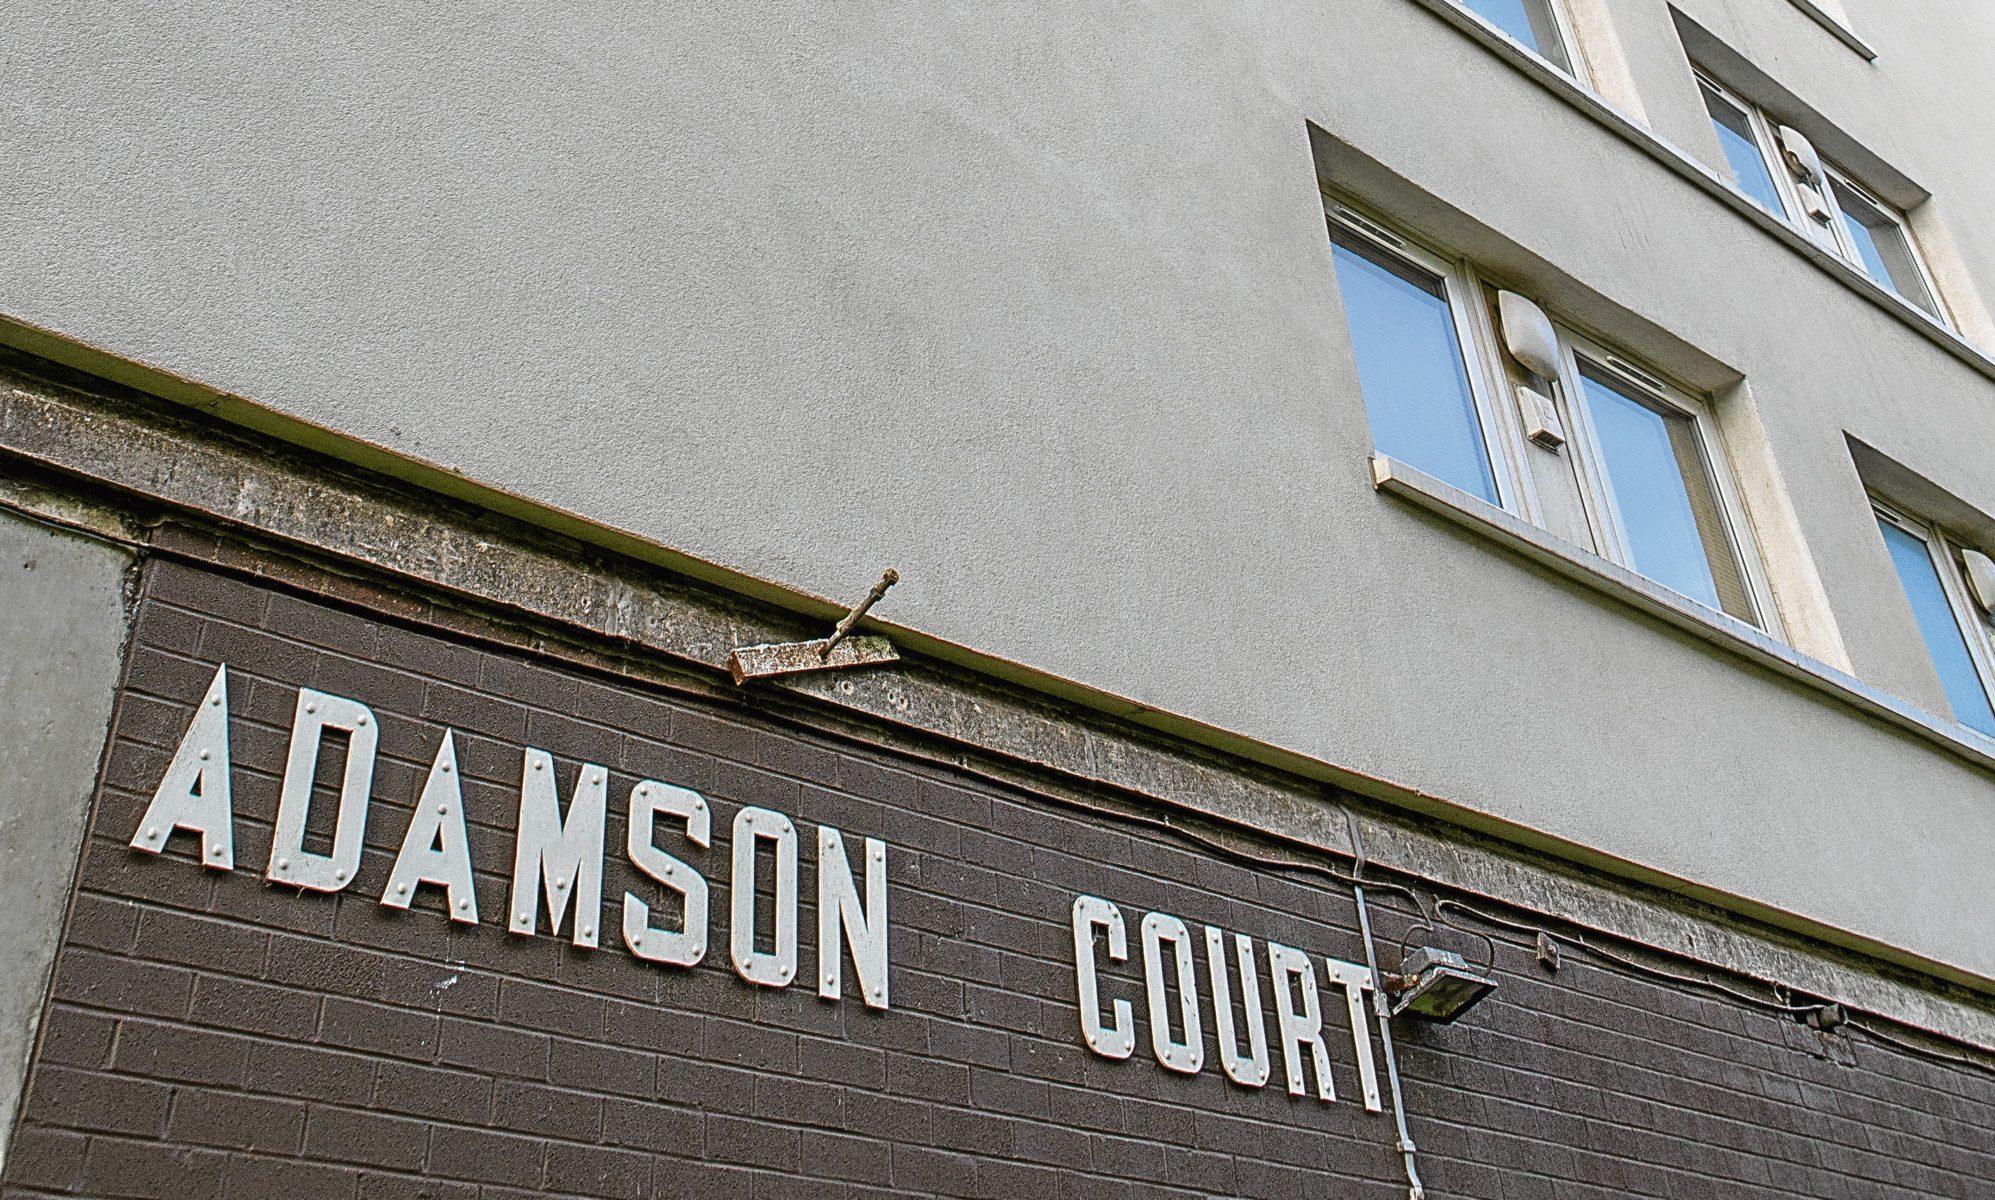 Adamson Court, Lochee (stock image)